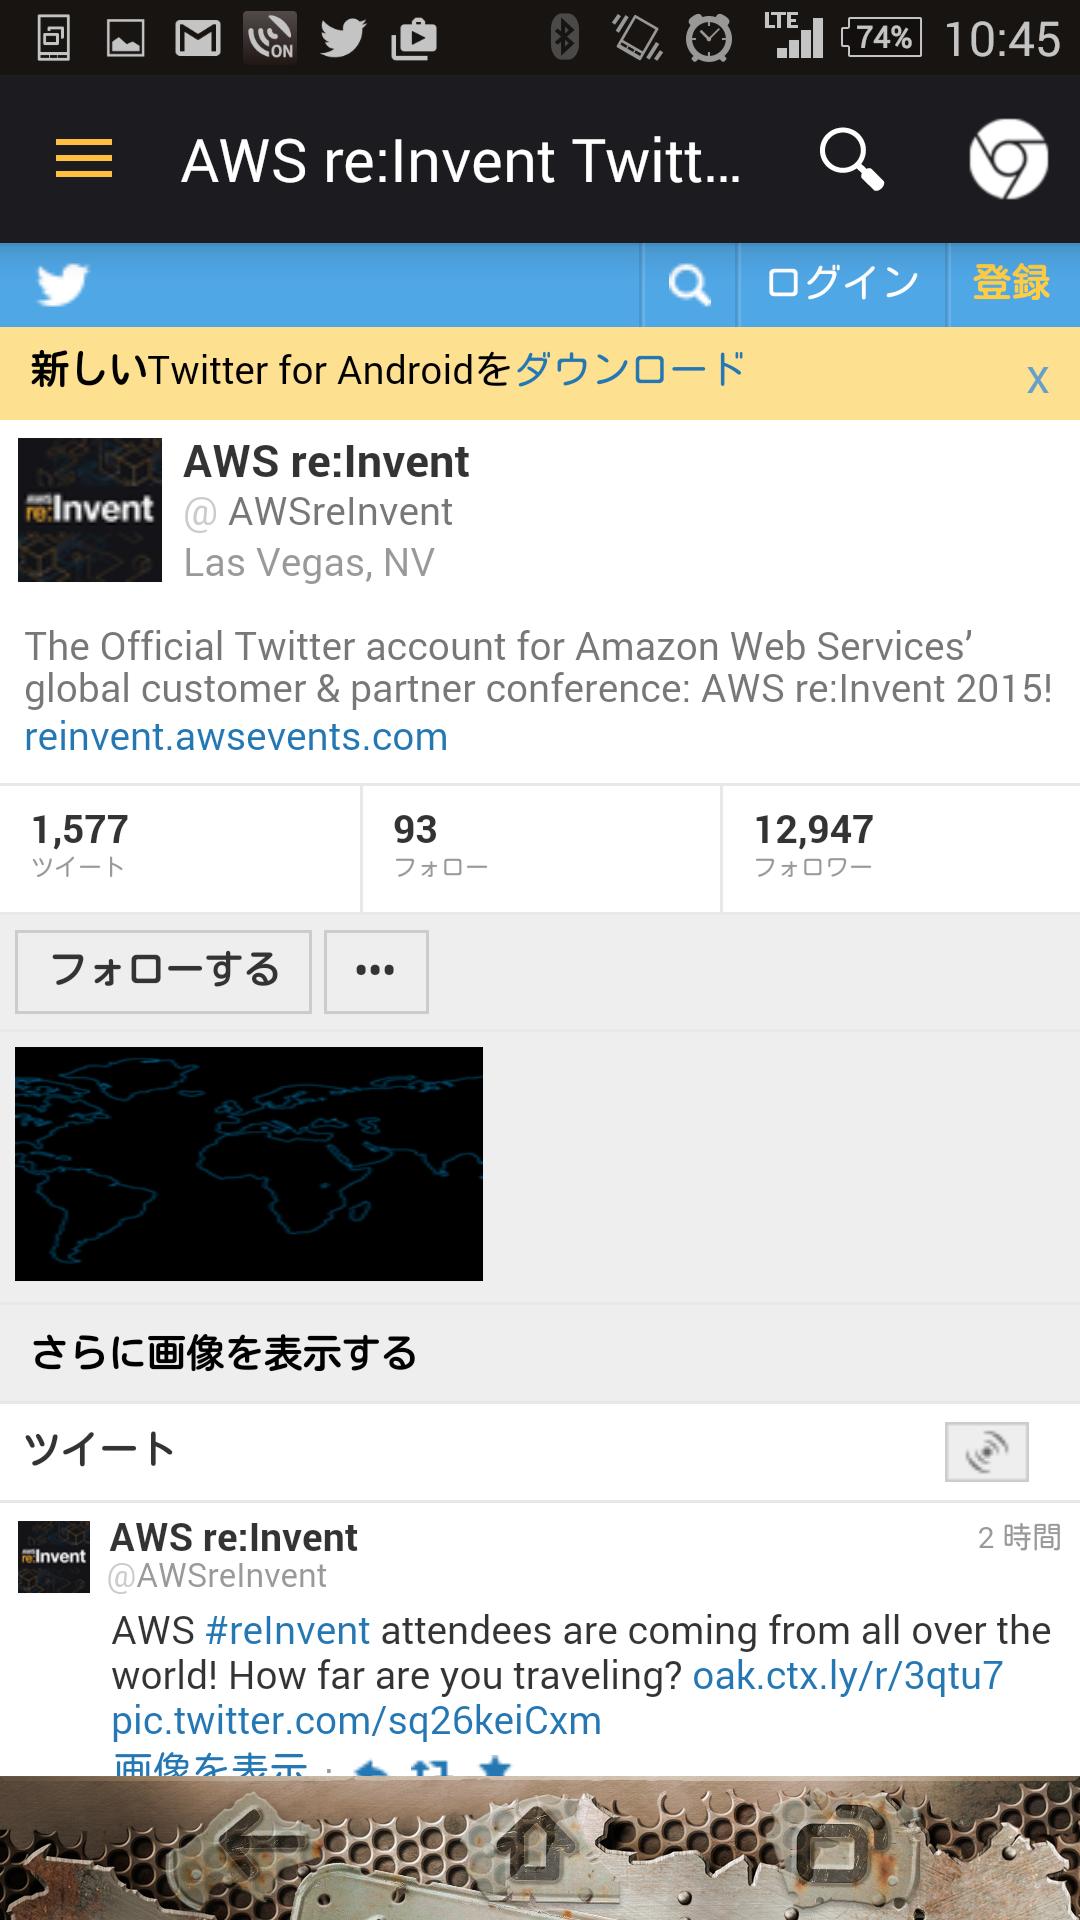 aws-reinvent-2015-event-app_23